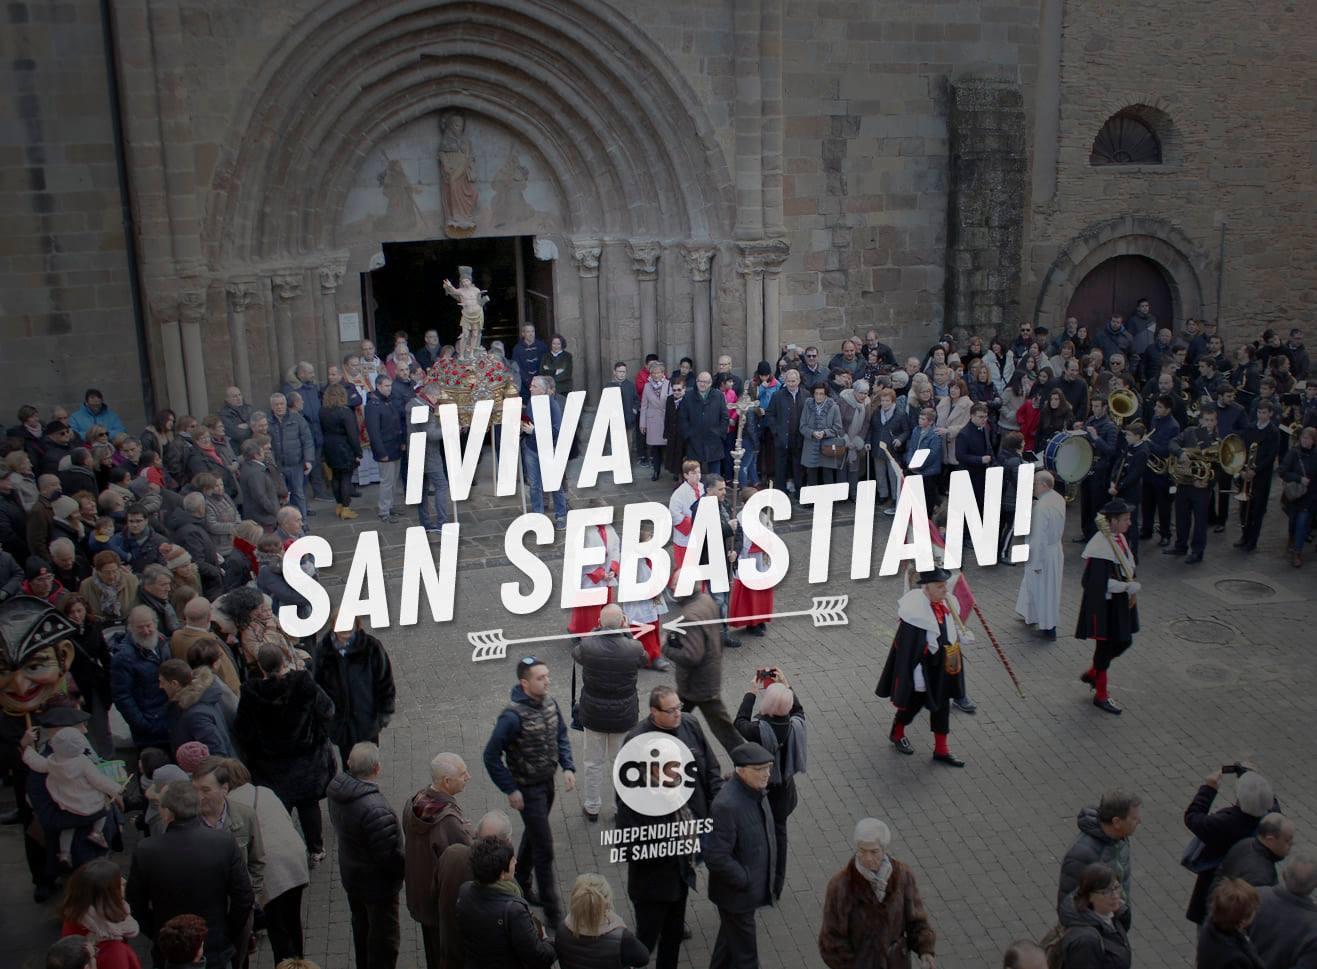 ¡Viva San Sebastián!